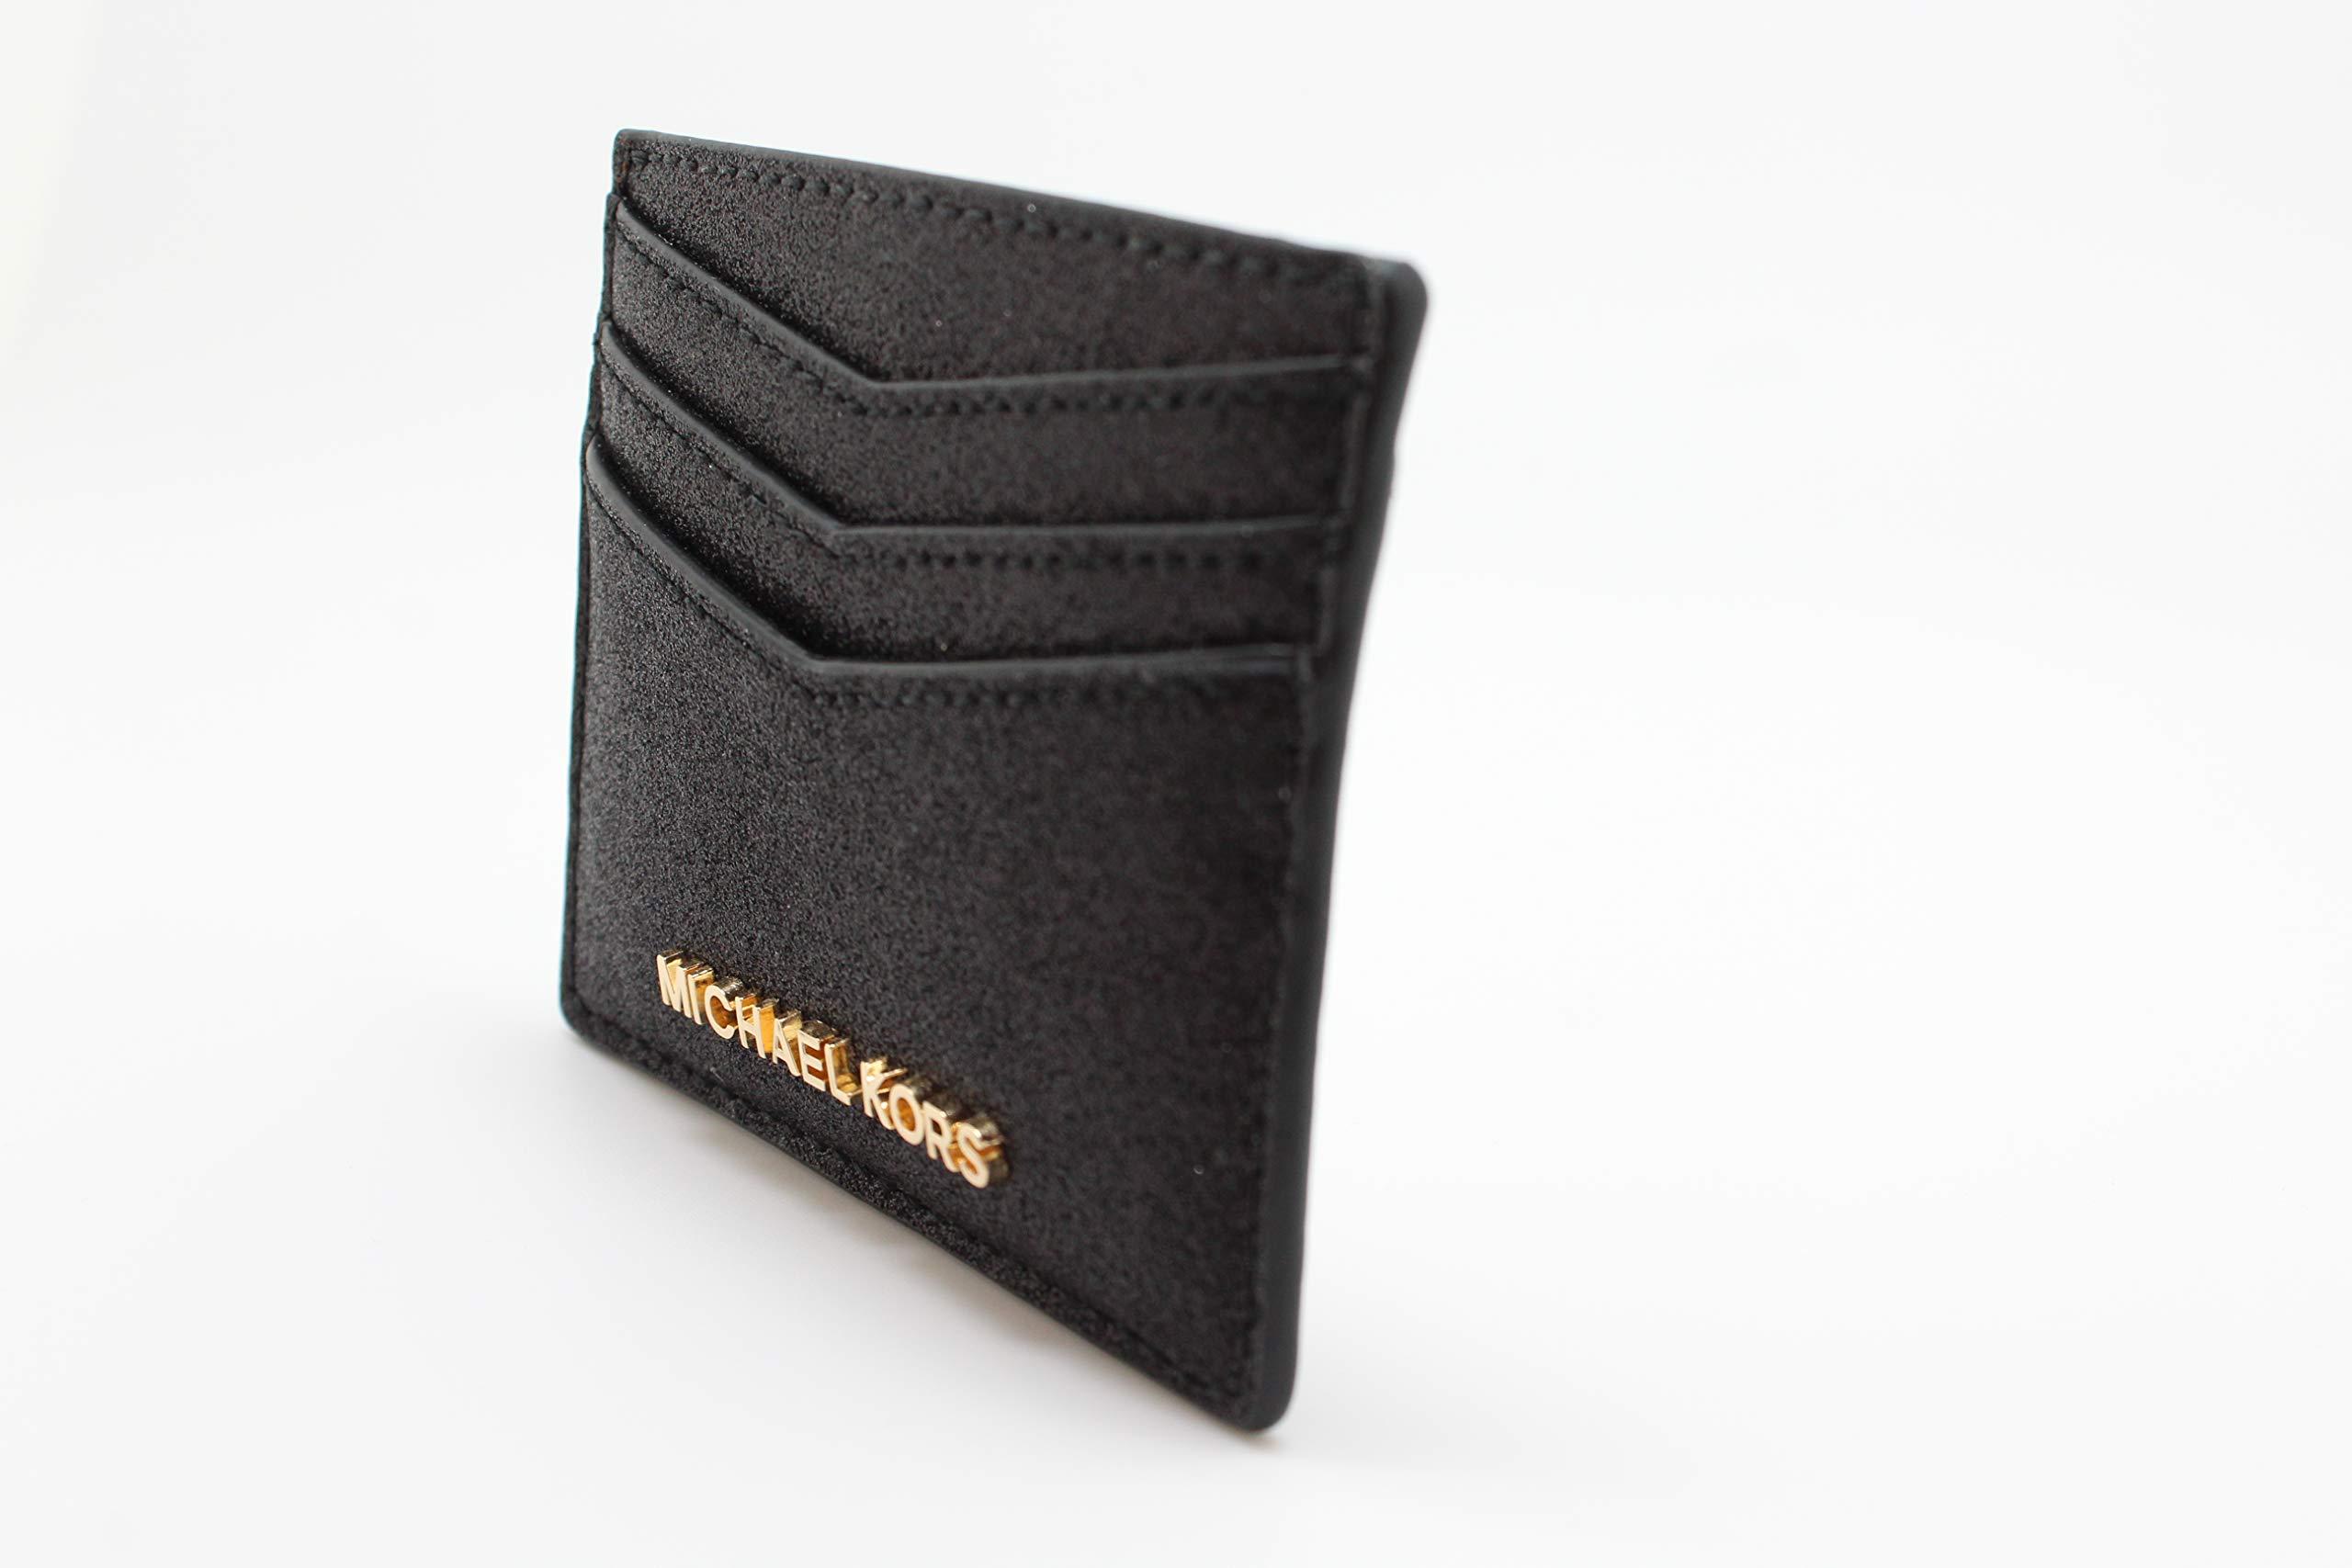 Michael Kors Giftables Large Card Holder Black Glitter by Michael Kors (Image #5)